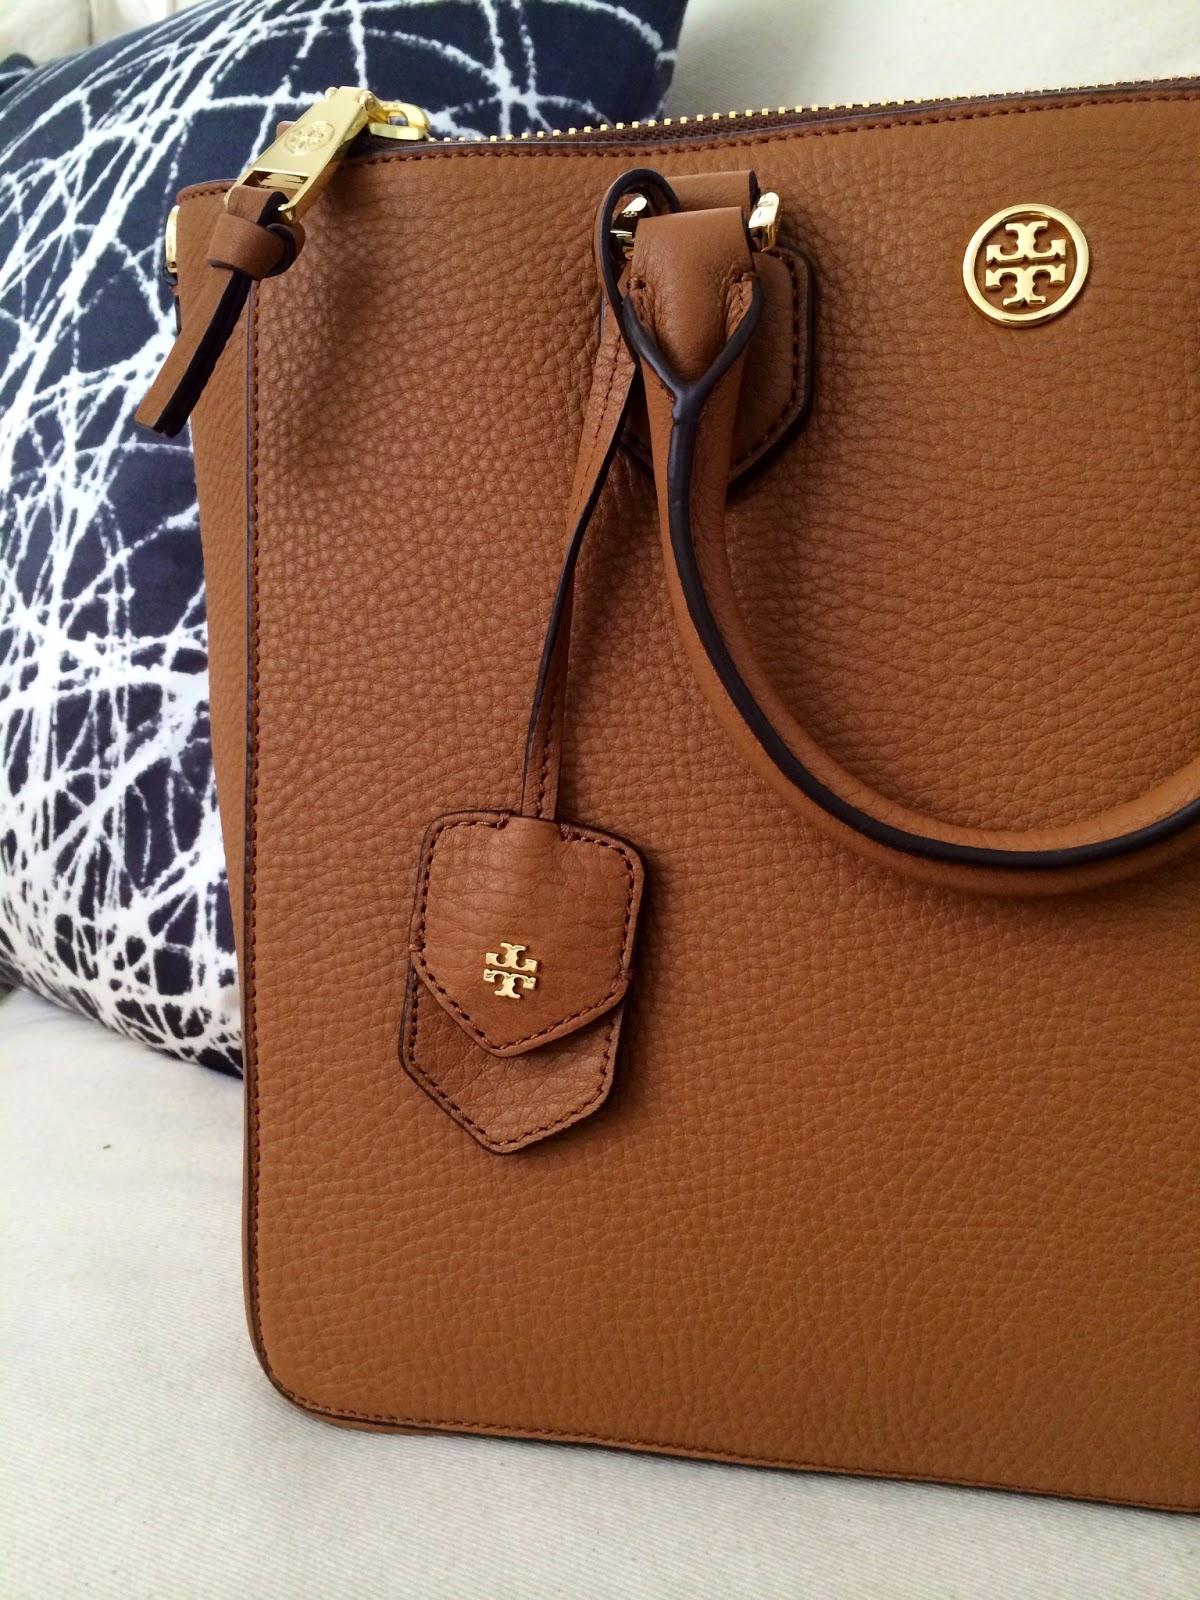 ab41507e612 NicoleVeronica  What s Inside My Bag  Tory Burch Robinson Pebbled ...